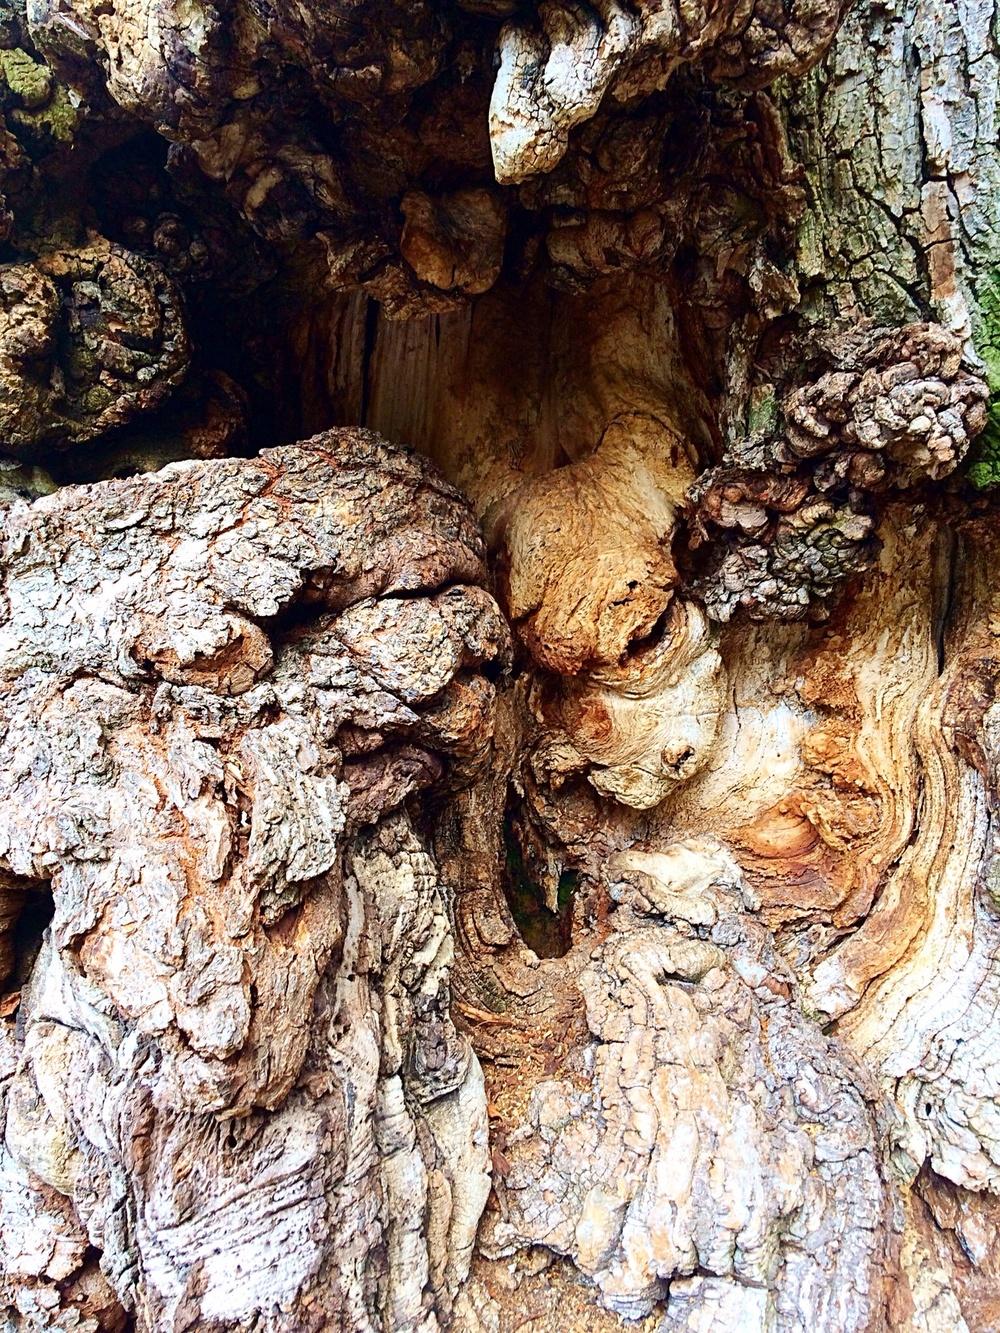 Twisted ash tree